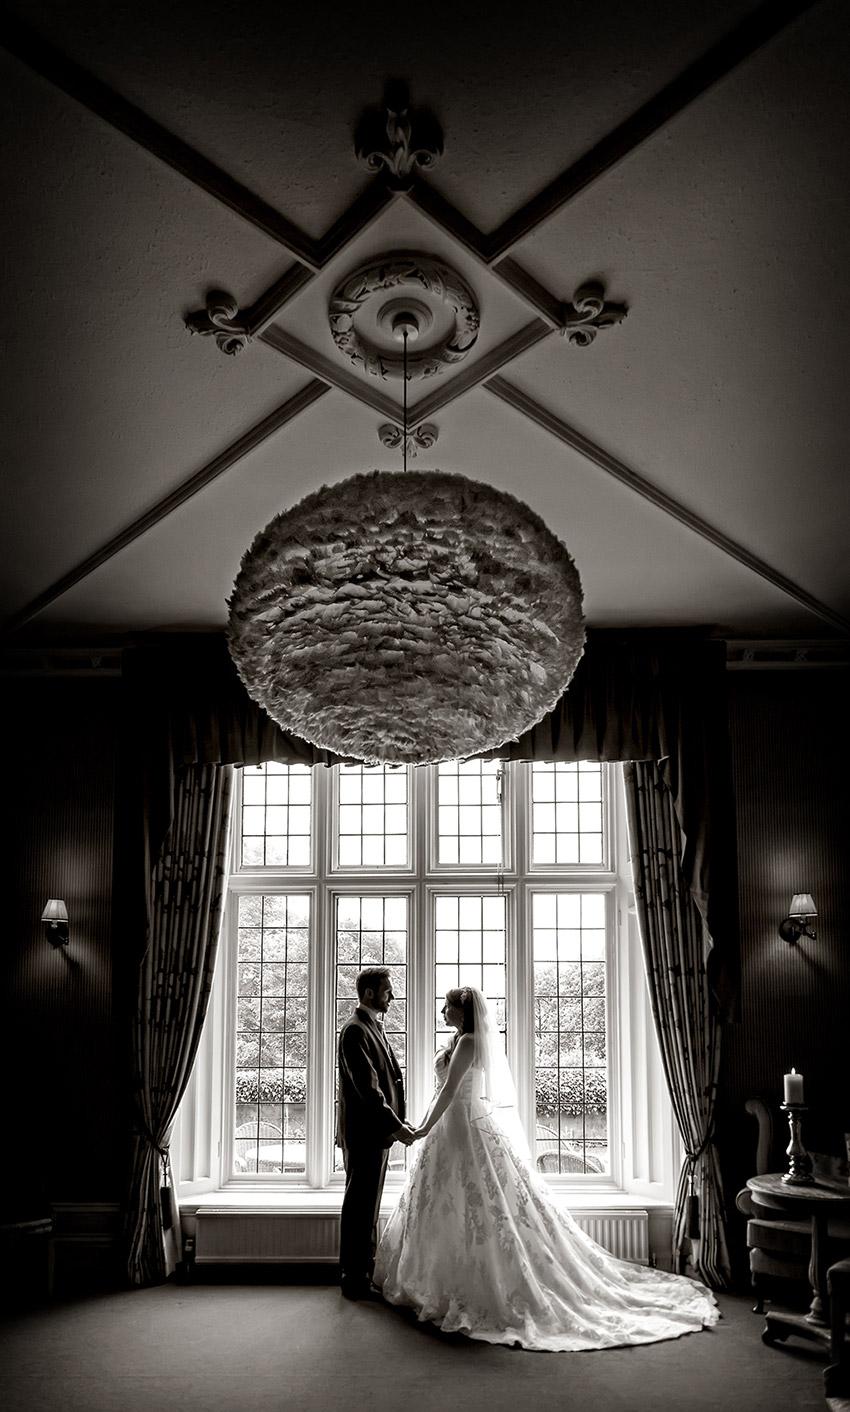 Falcon Manor Wedding Photography - Weddings